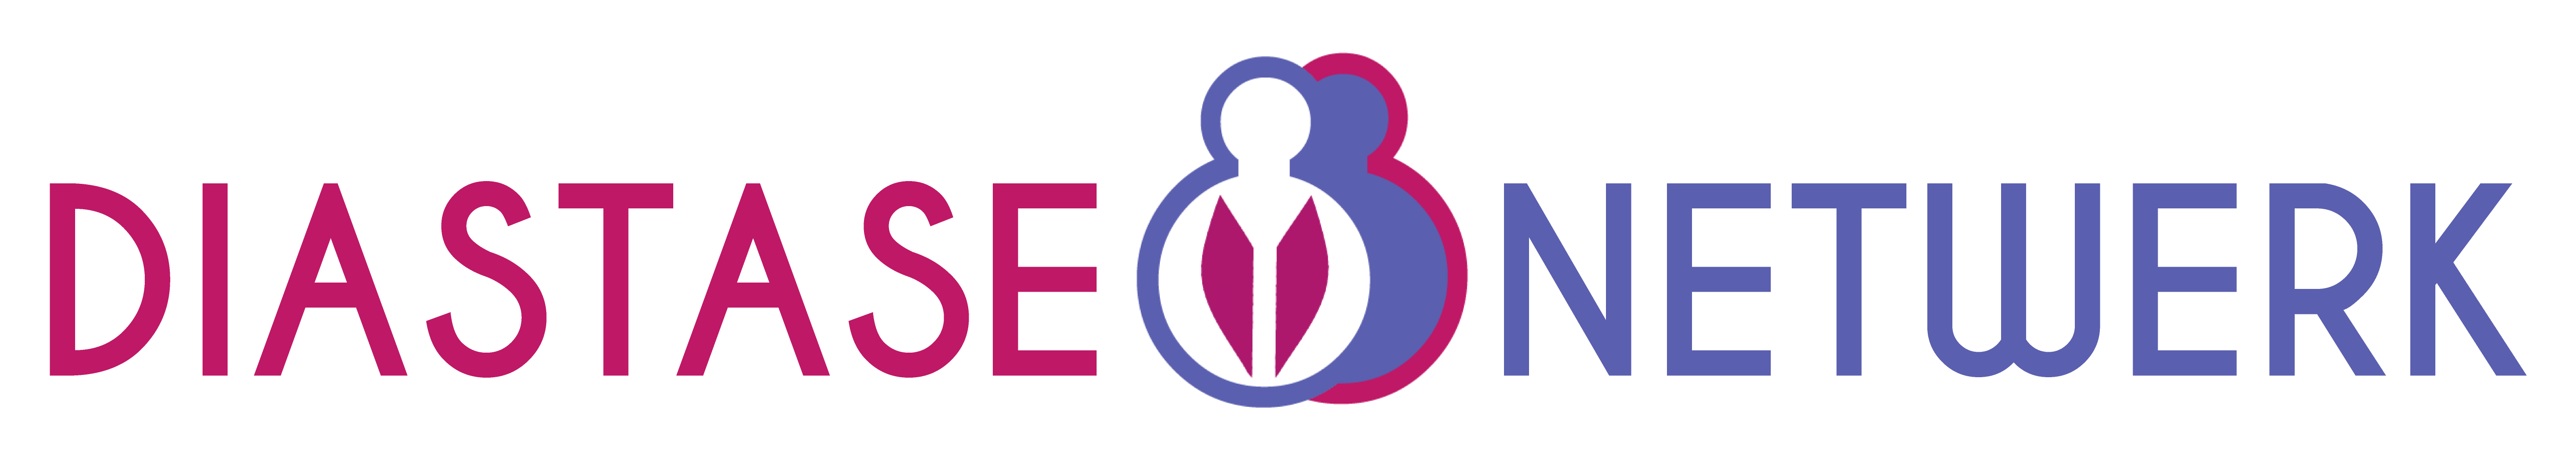 DiastaseNetwerk Nederland